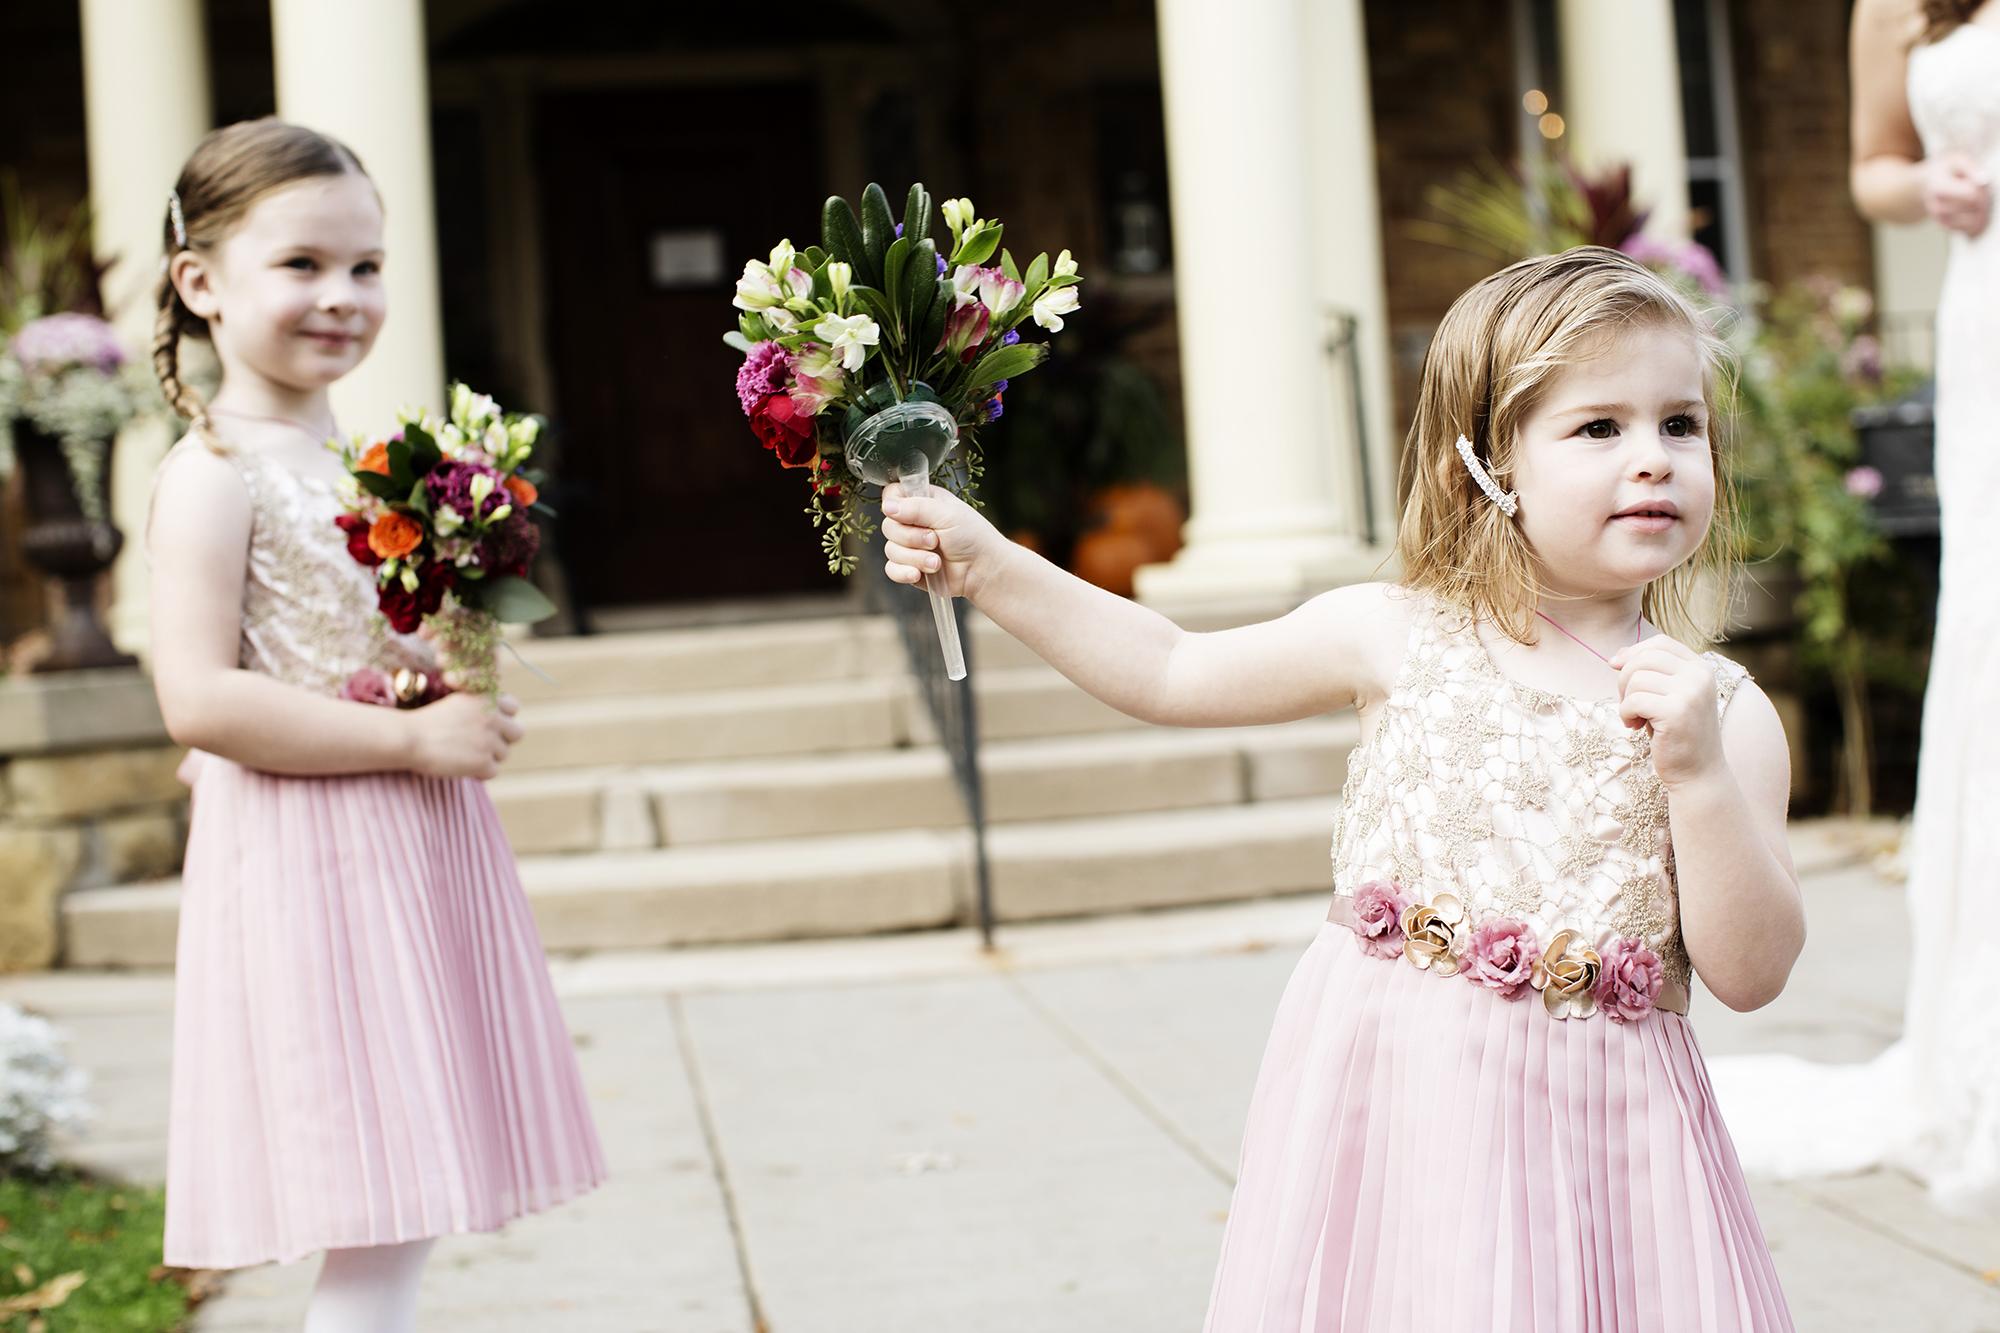 Wedding Photographers MN   Photography by Photogen Inc.   Eliesa Johnson   Based in Minneapolis, Minnesota